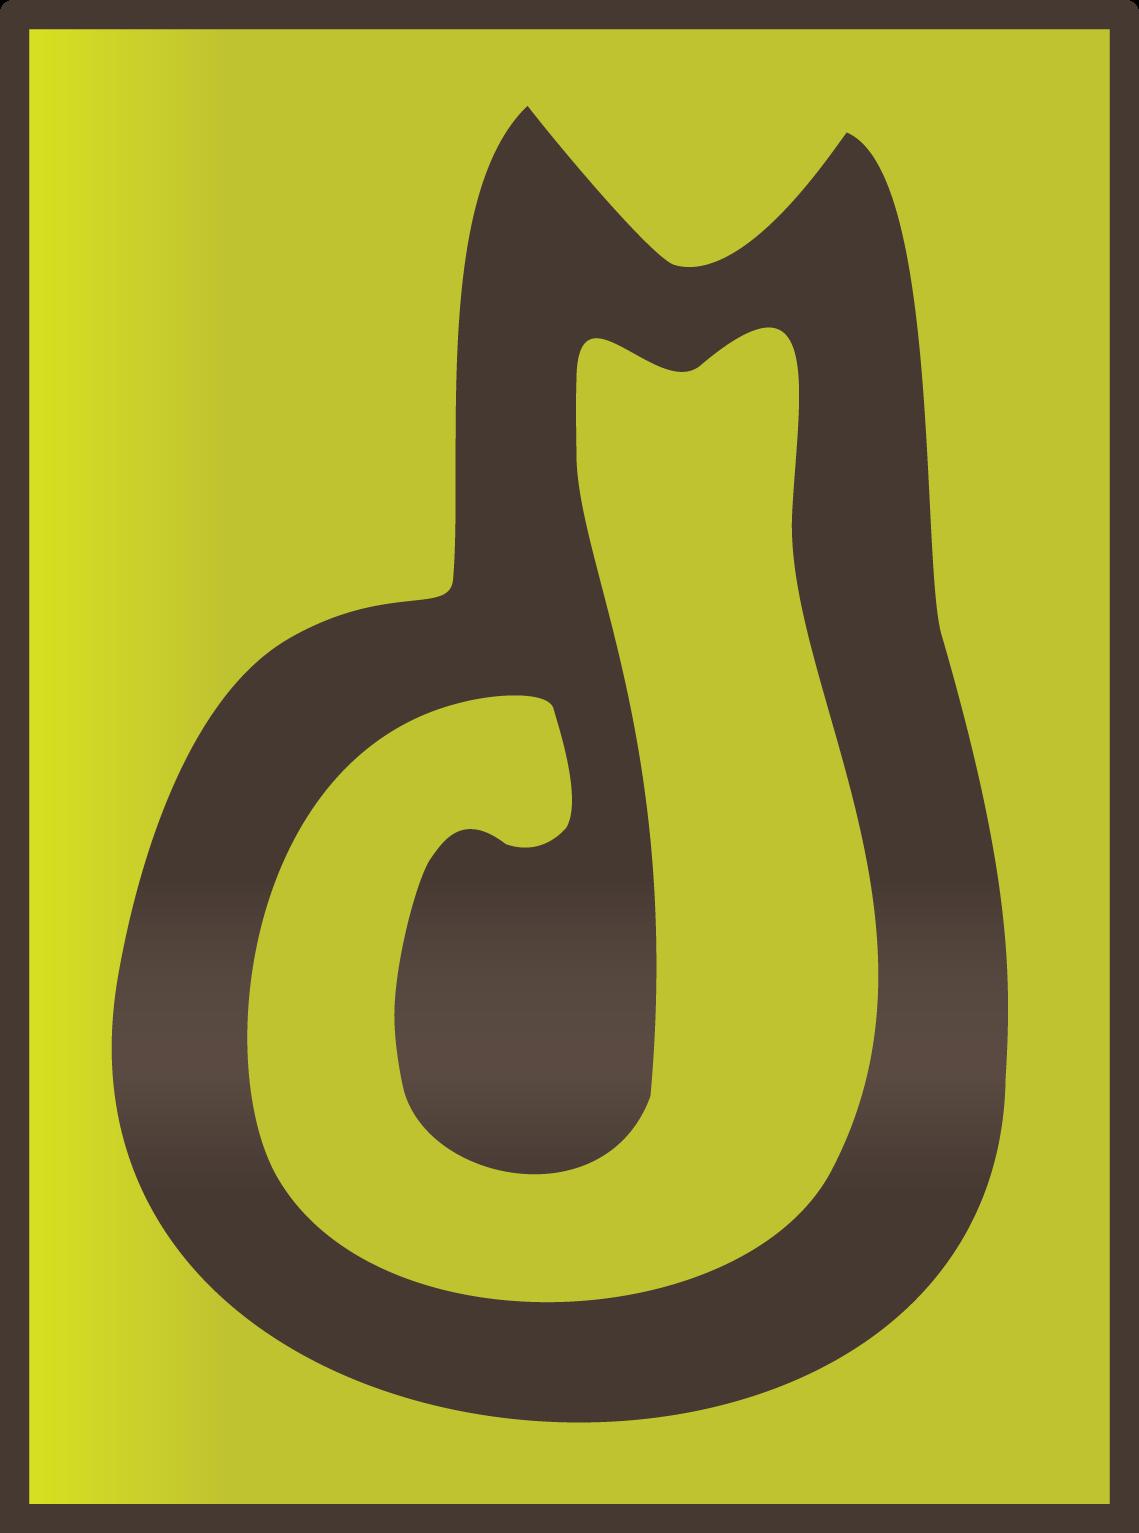 C MARCIN DESIGN by clolrly